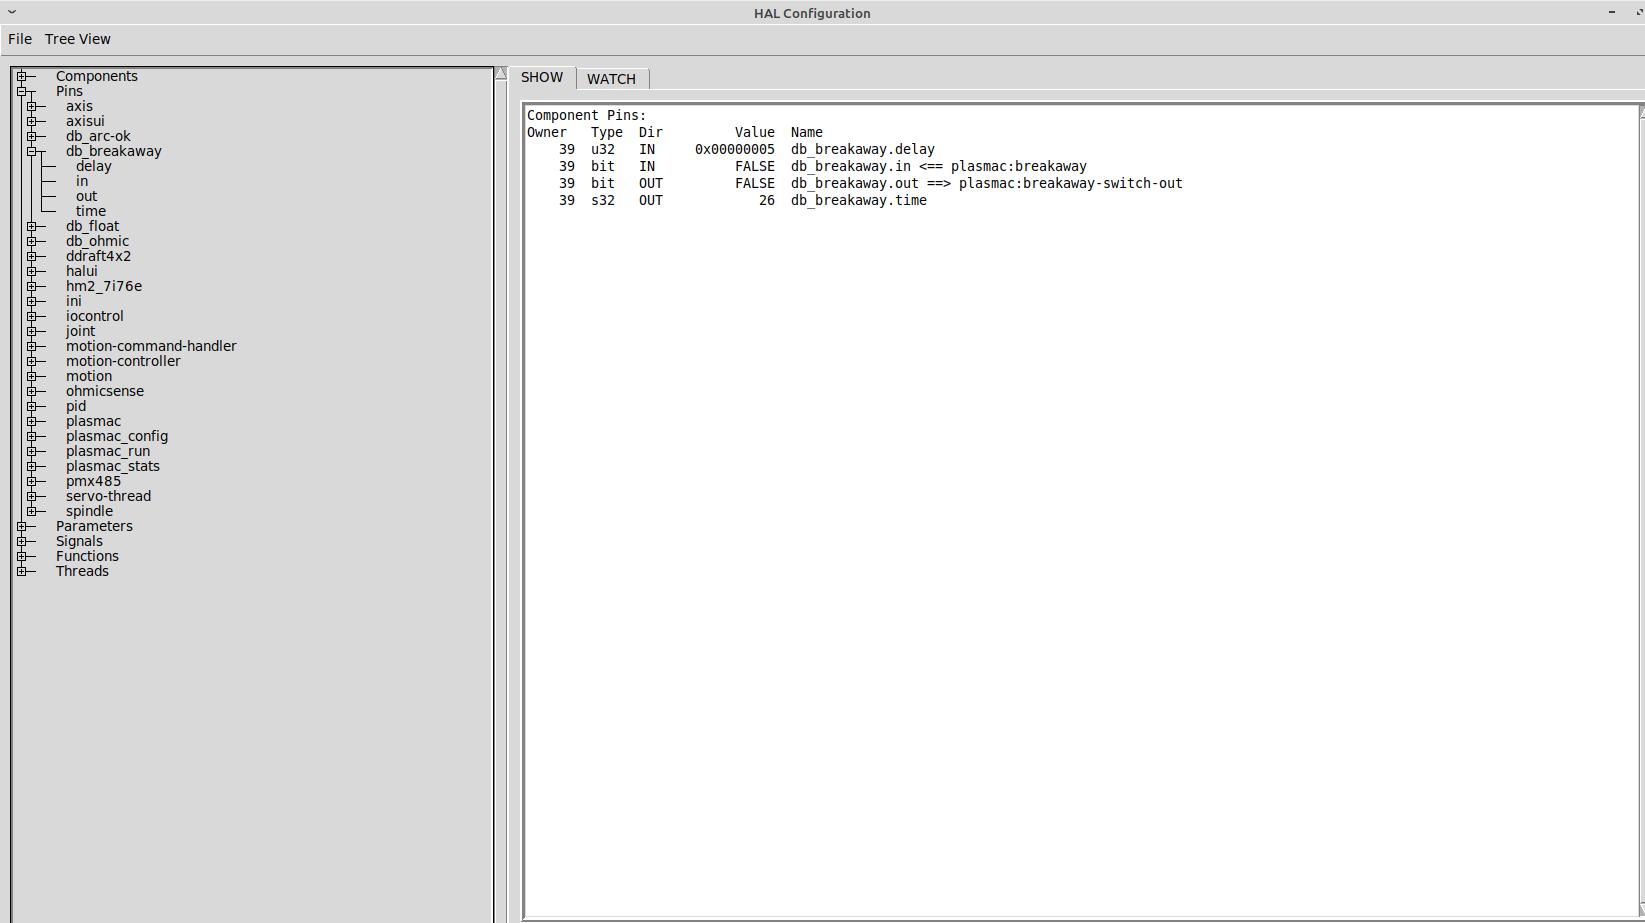 Screenshot_2021-04-30_15-02-39.png